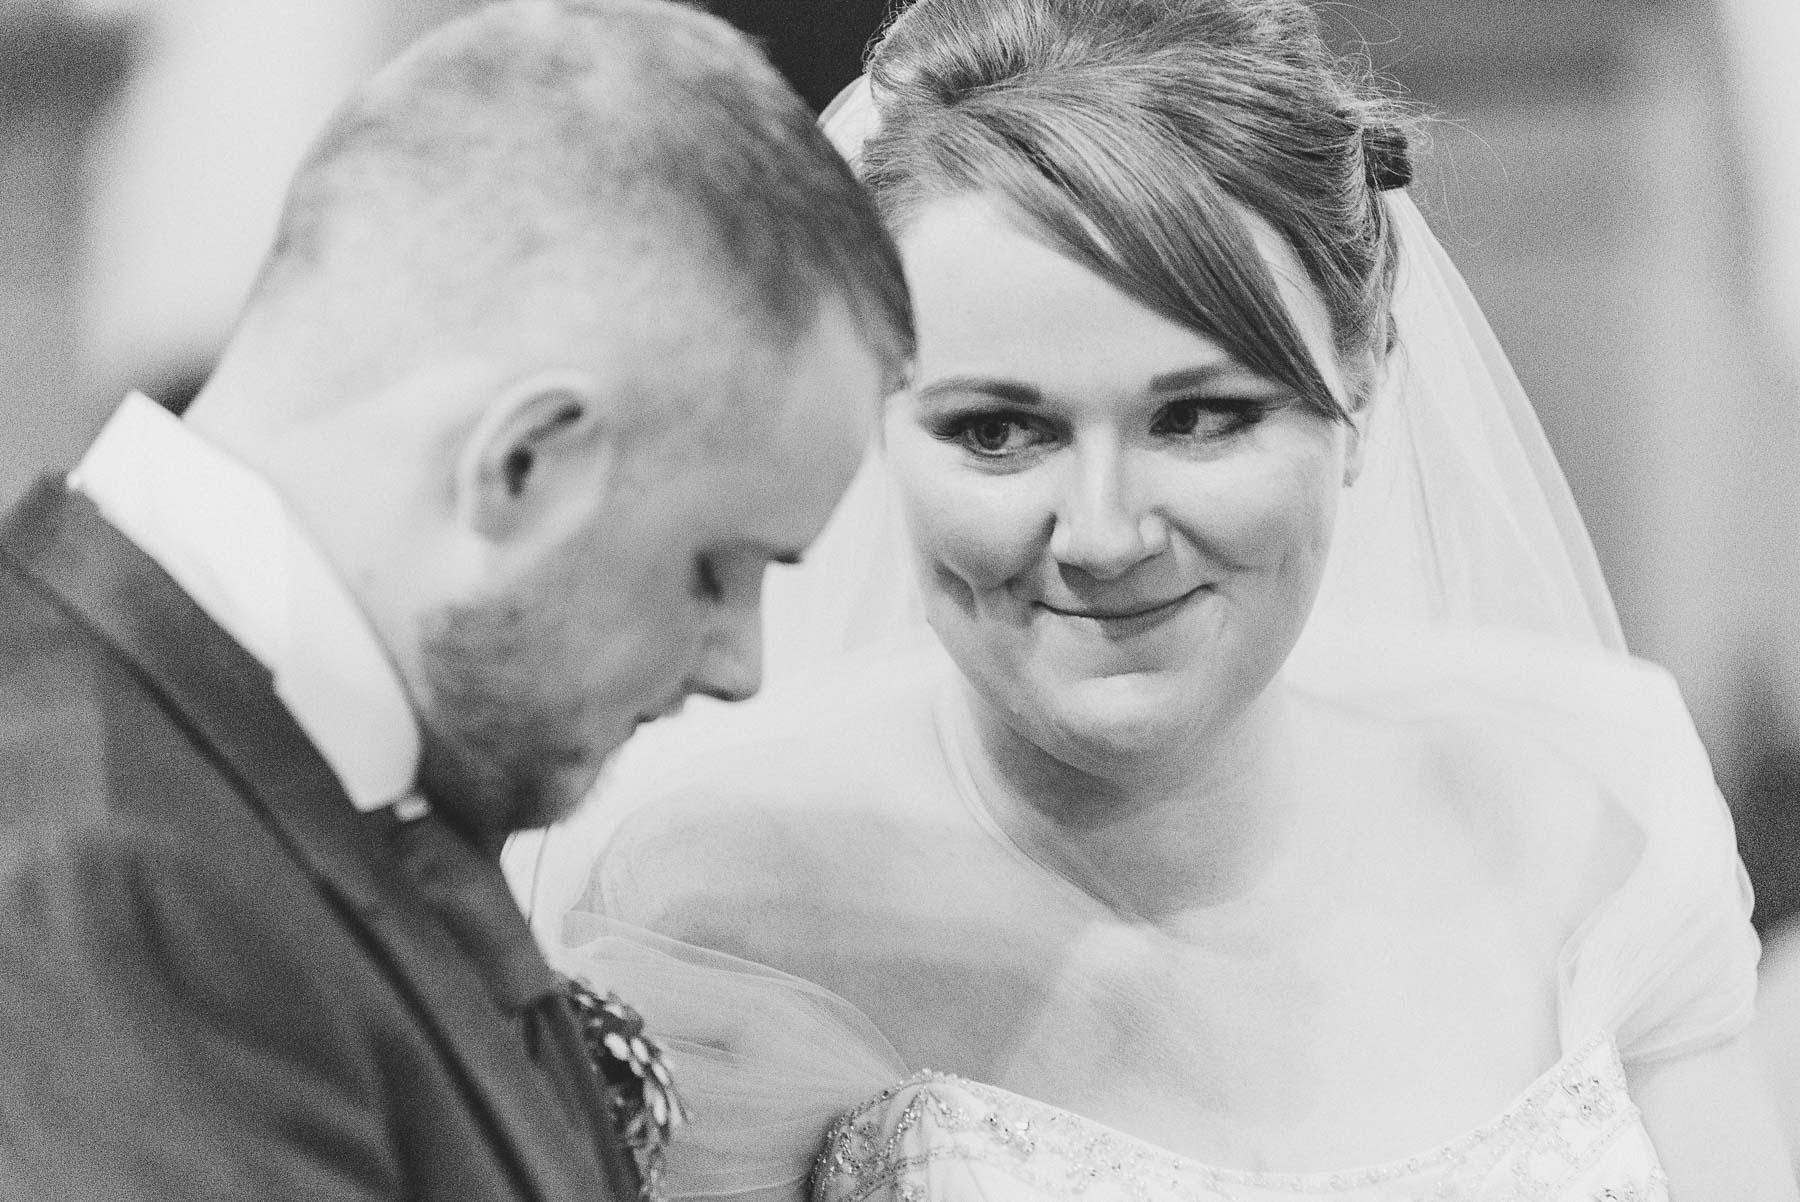 Bride looks happily at groom